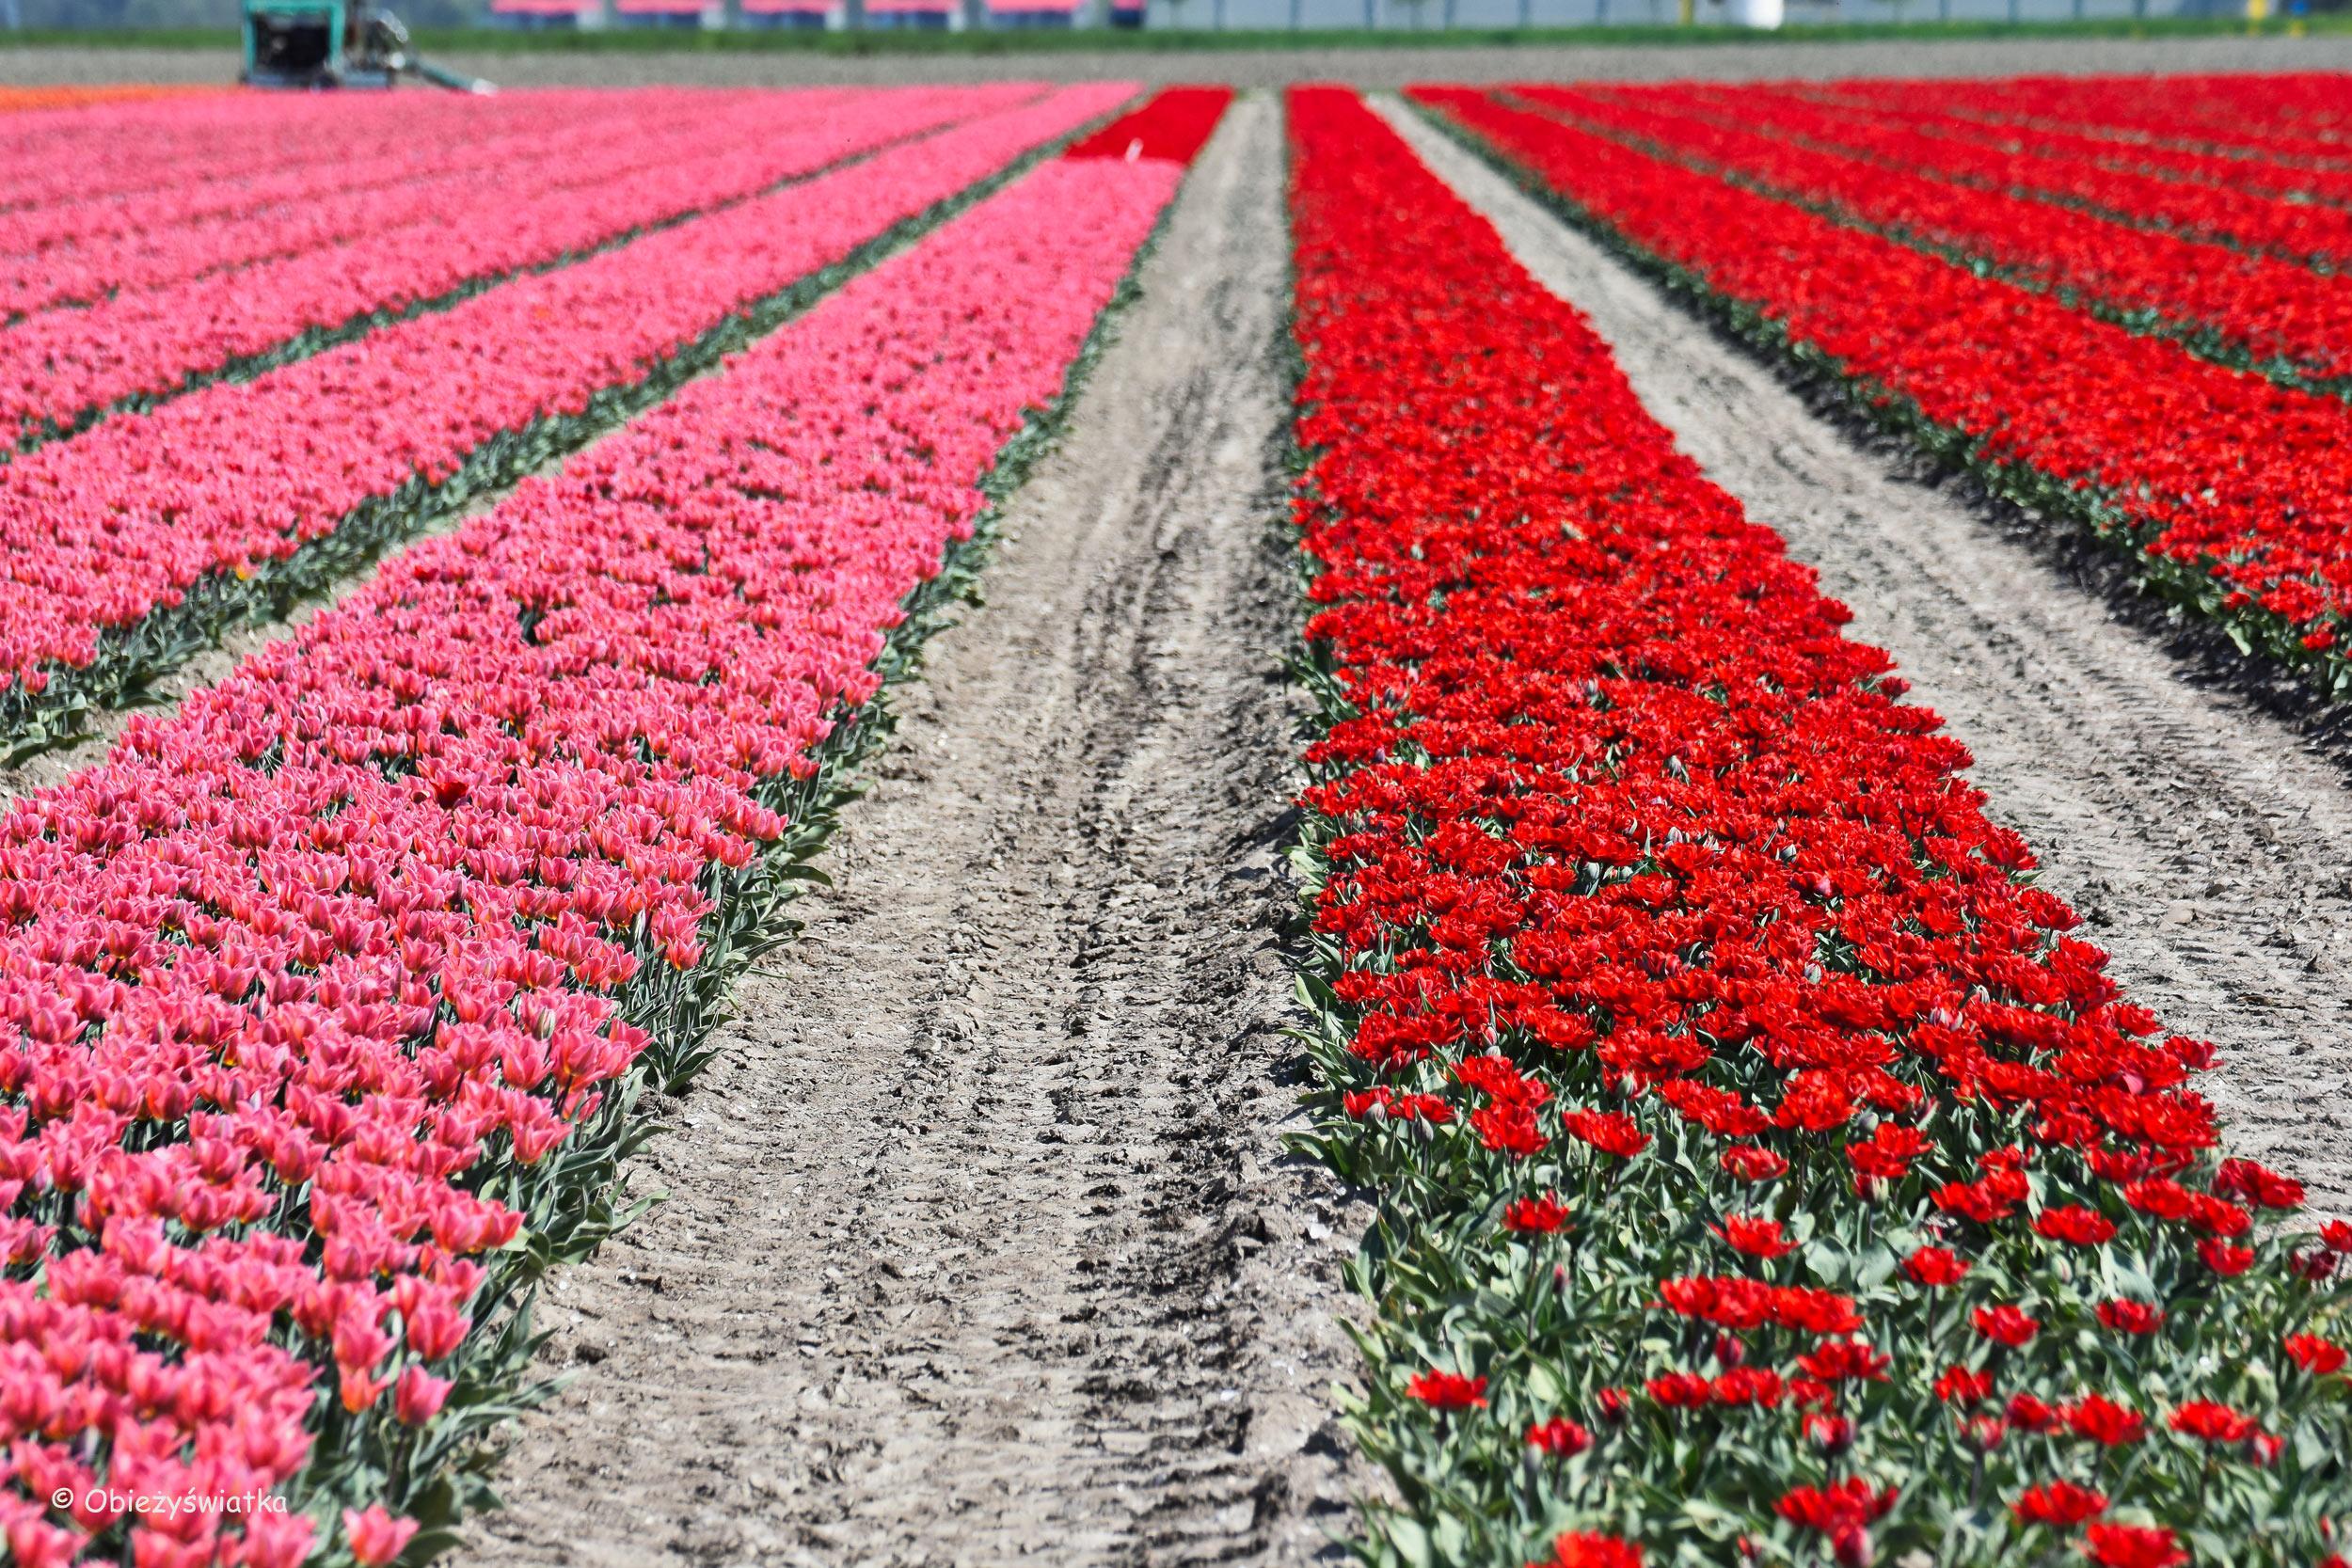 Tulipanowe pola w Holandii - dwukolorowo